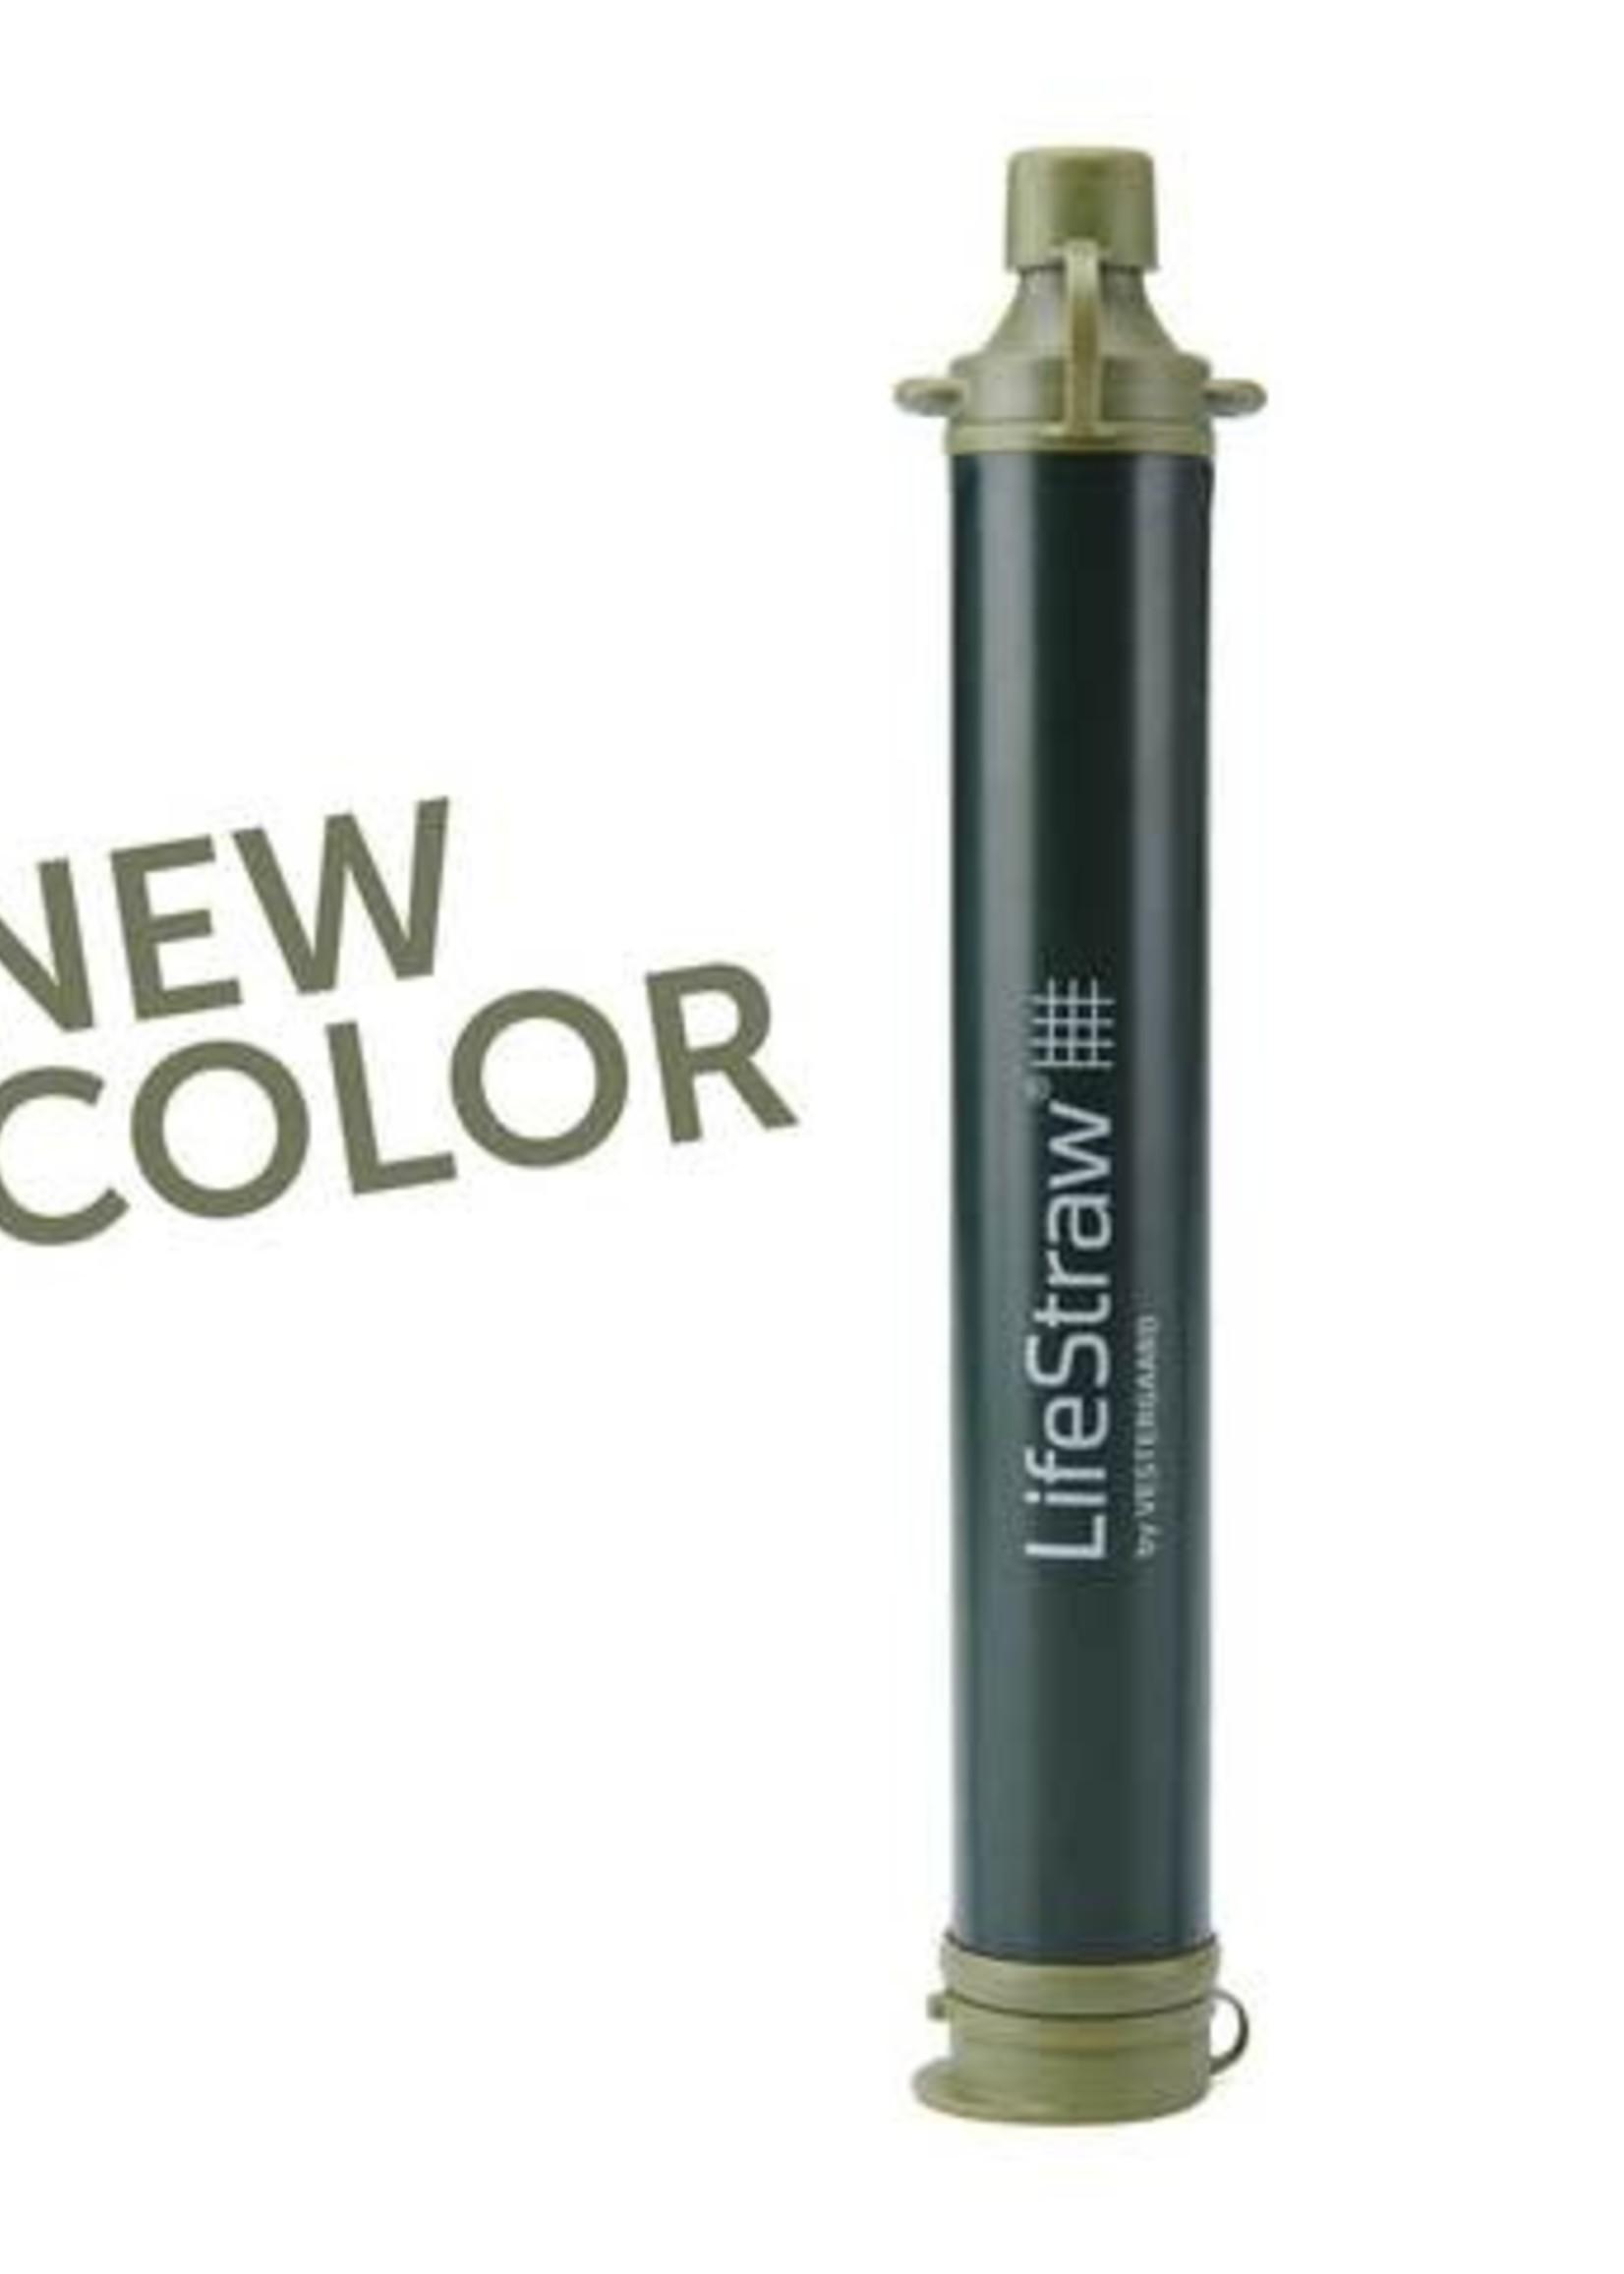 LifeStraw Lifestraw Water Filter